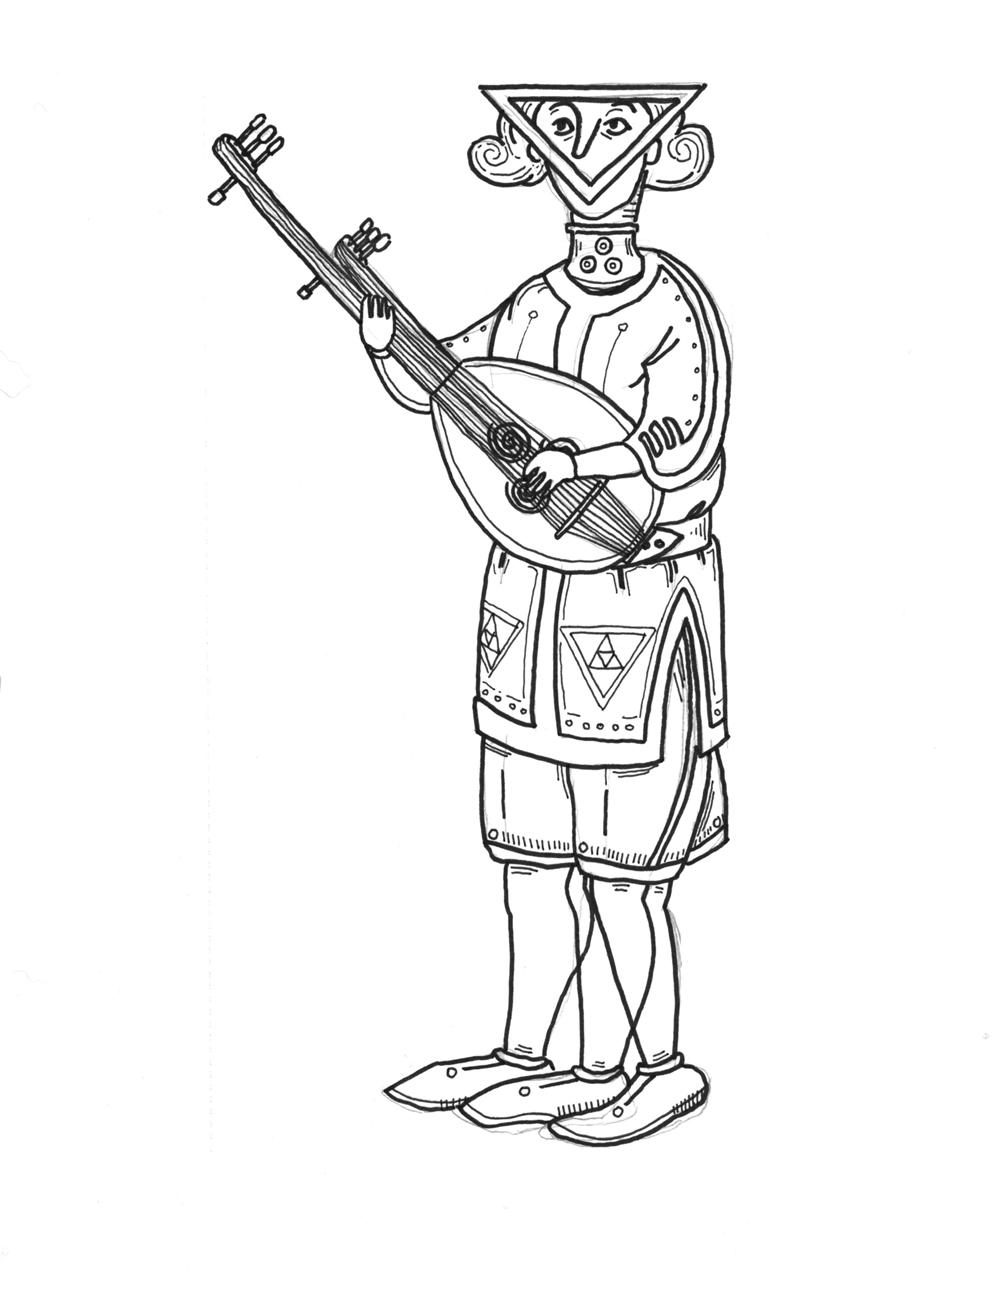 Artist's Representation of a Quatrian Funerary Urn Depicting a Sacred Triangulon Musician